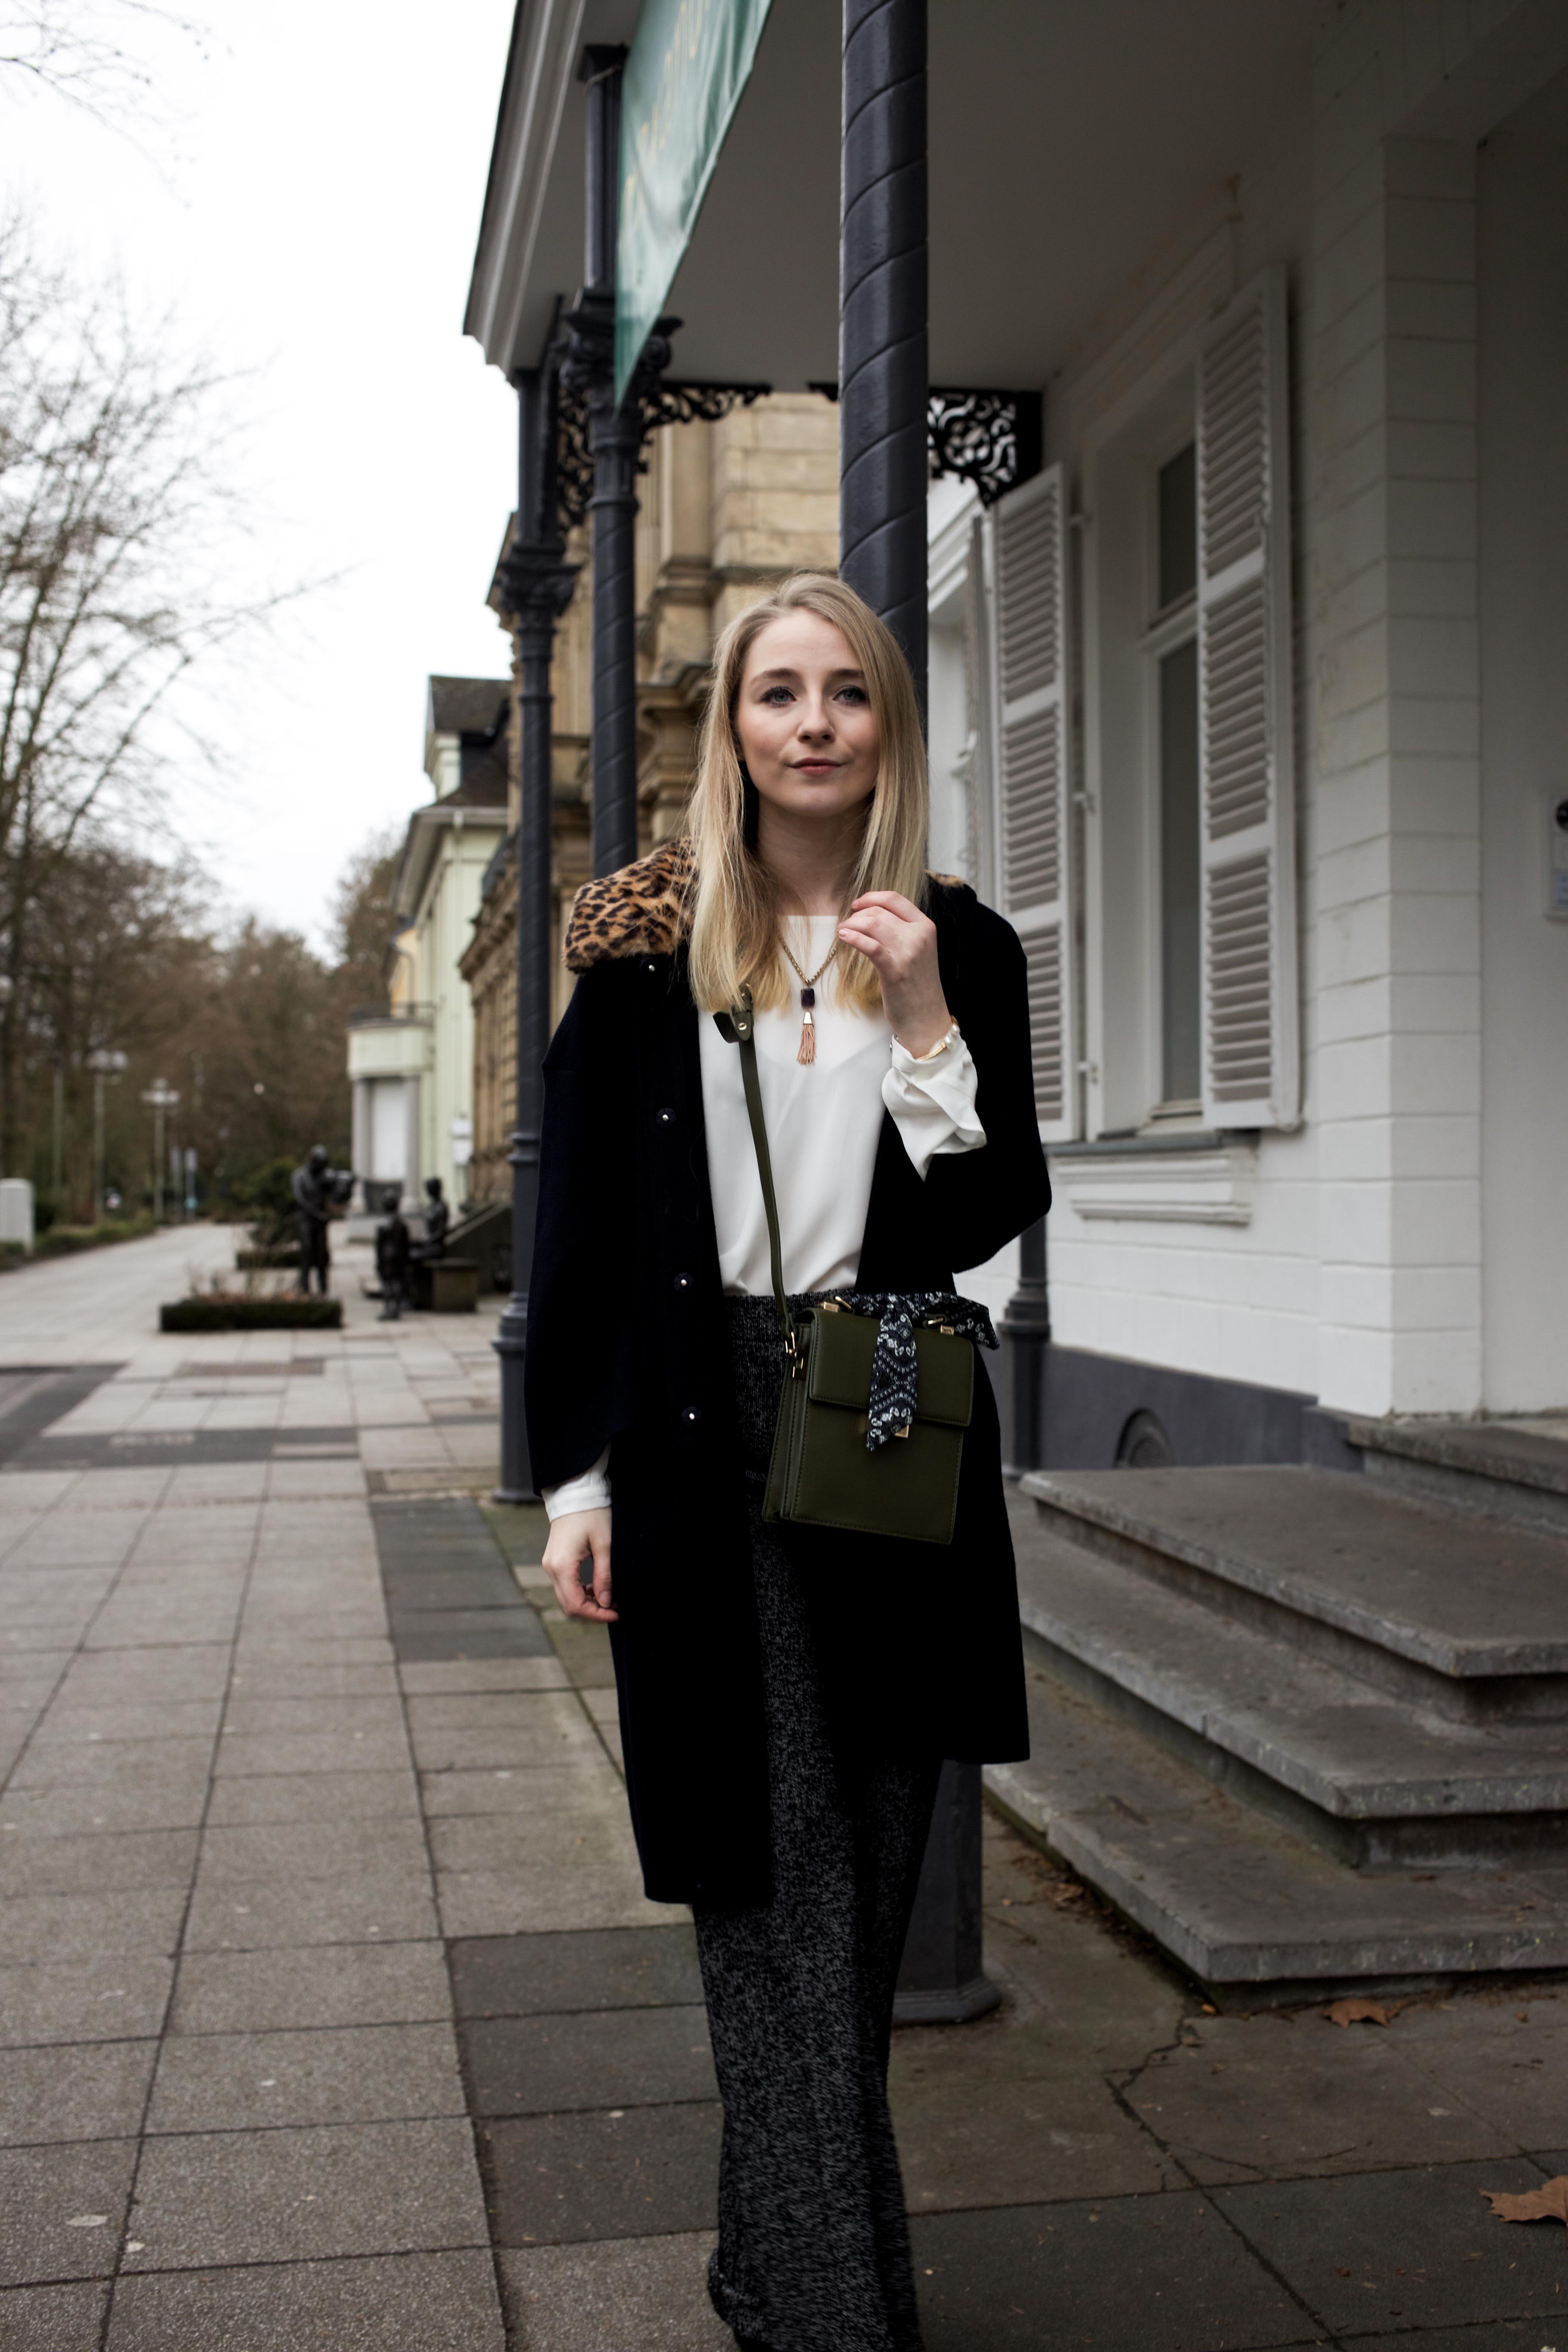 marlenehose-kombinieren-streetstyle-look-modeblog-fashion-blog-cologne-berlin-bonn_9937